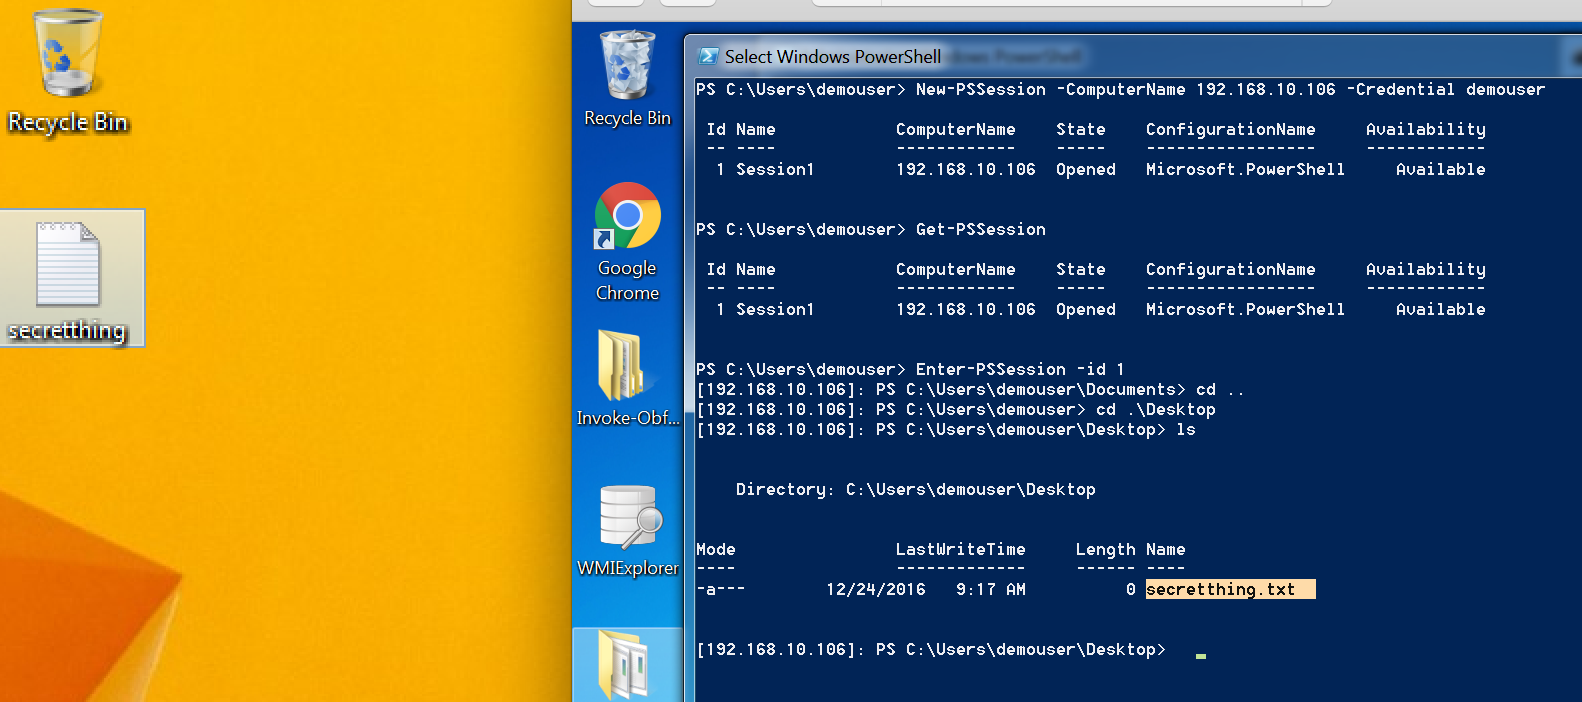 Windows Powershell Web Access Pentest